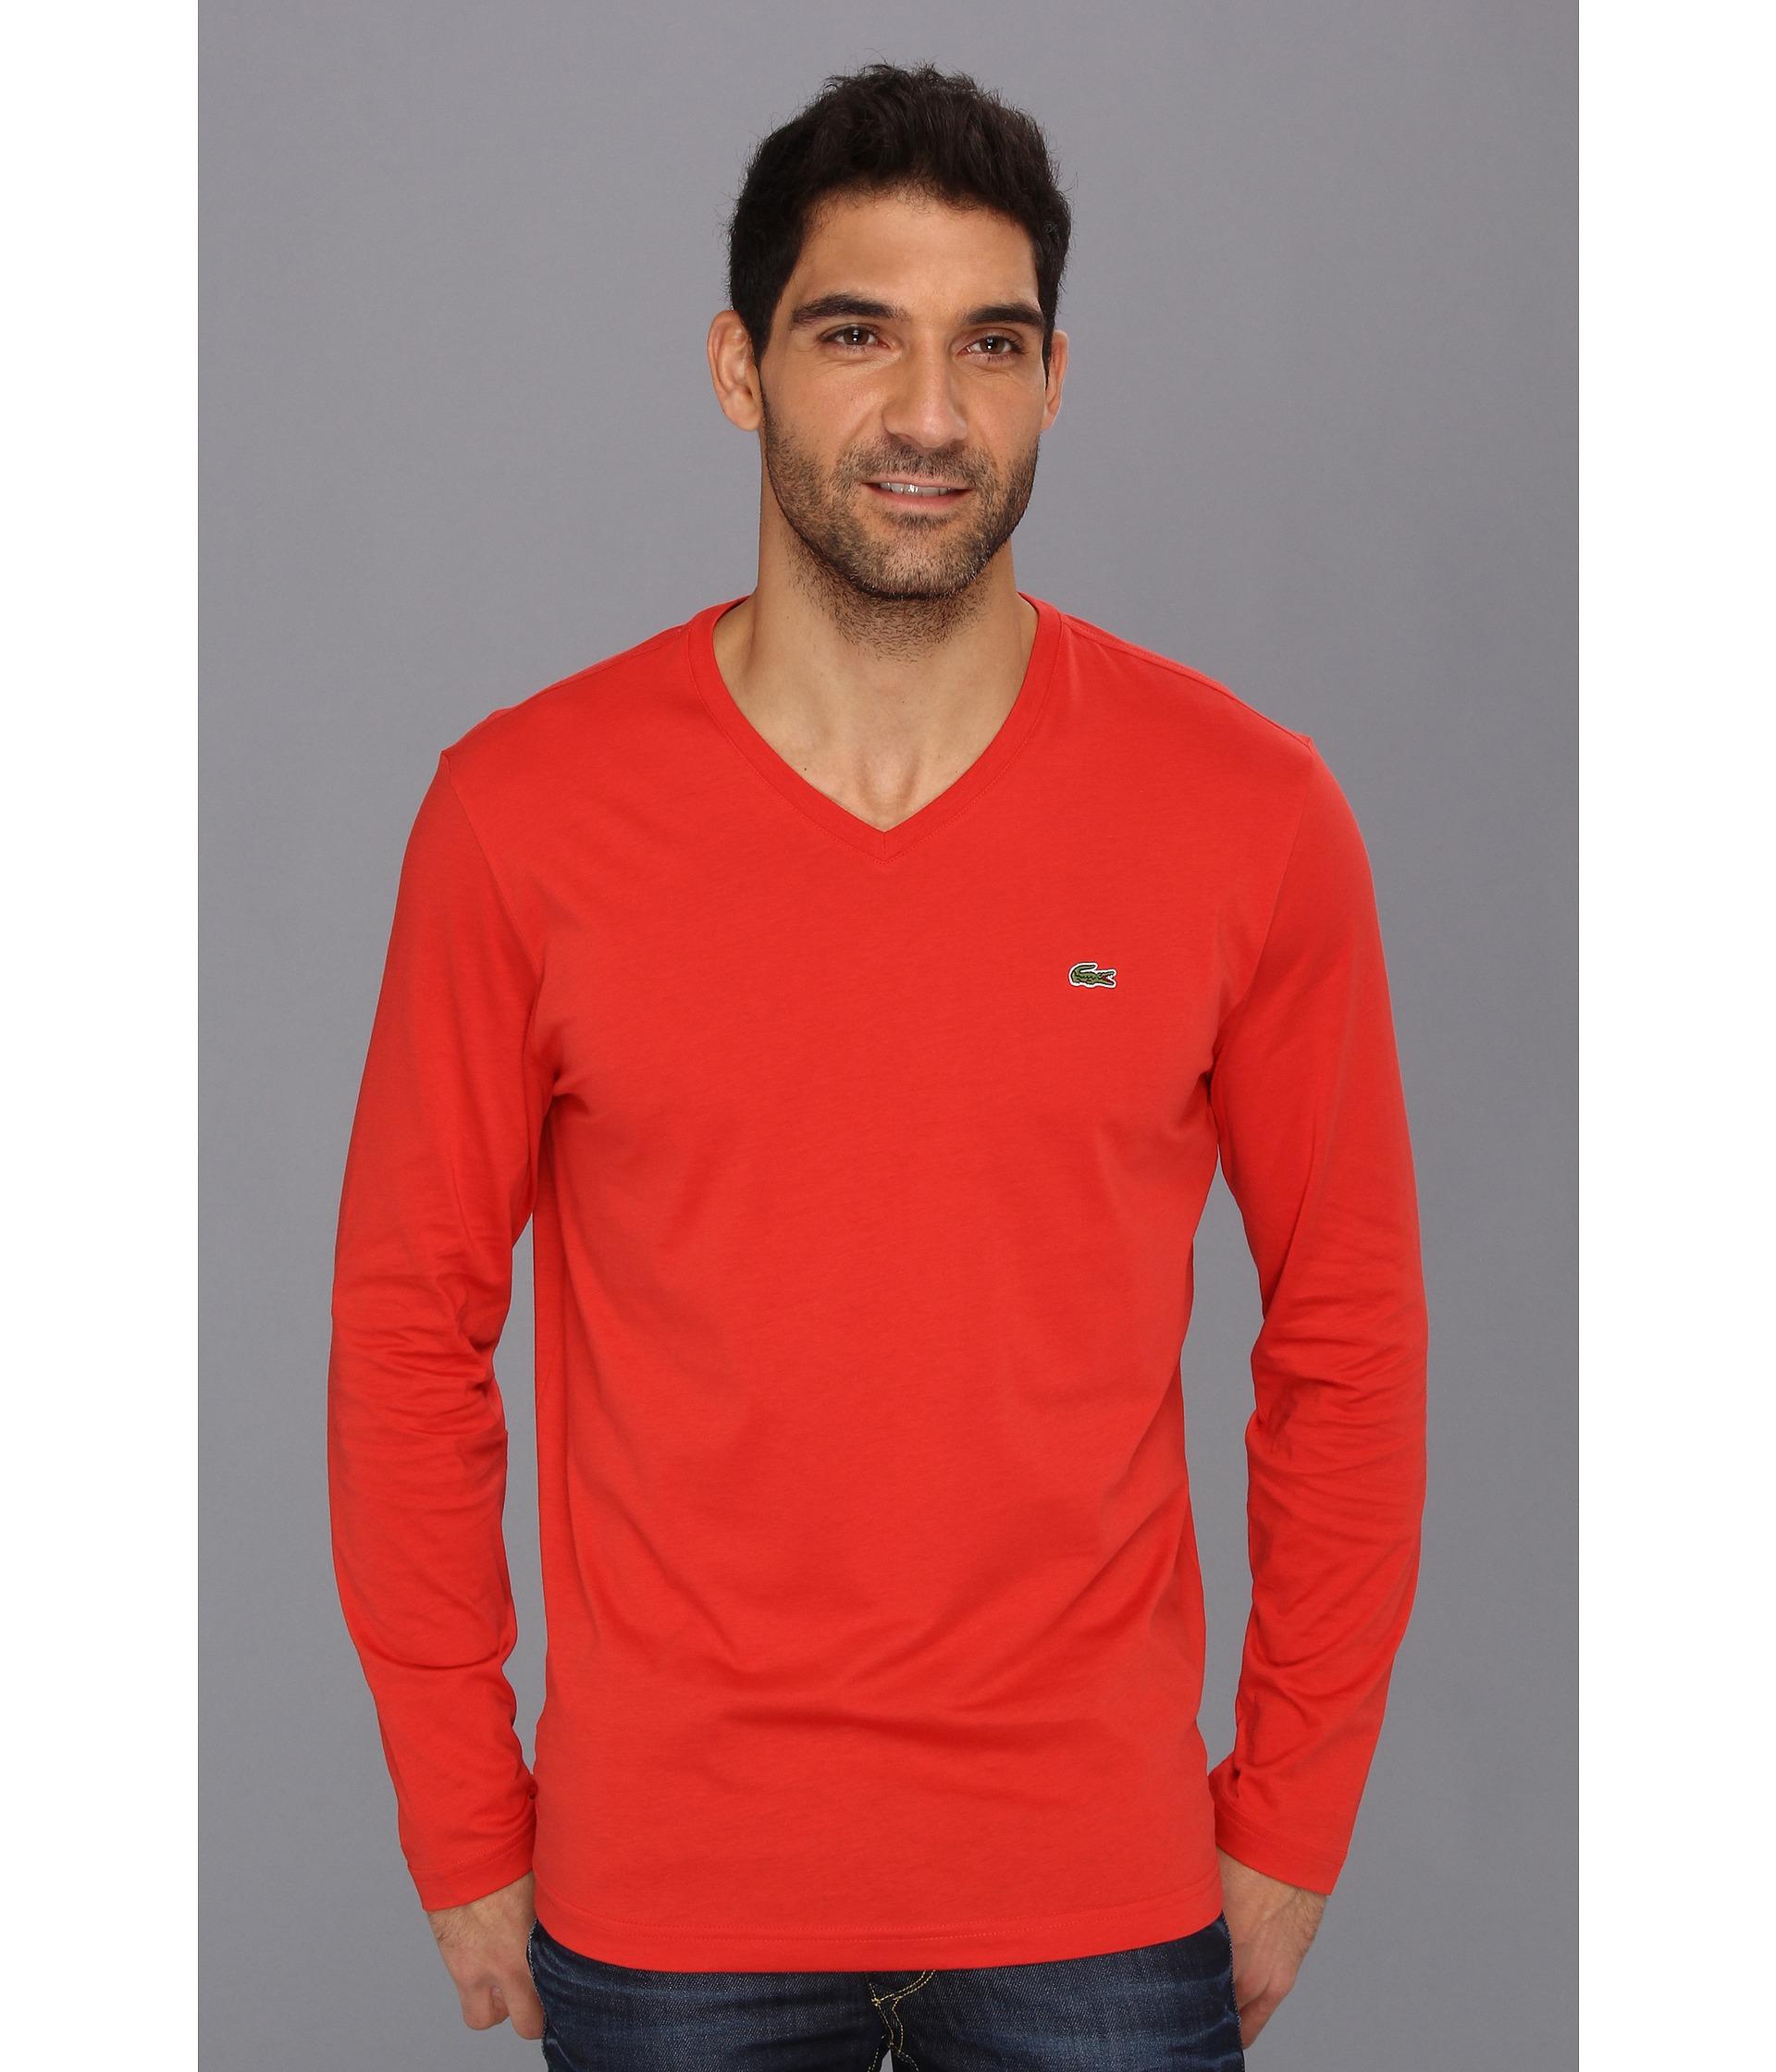 daf91dd68d4613 Lyst - Lacoste Long Sleeve Pima Jersey Vneck Tshirt in Red for Men